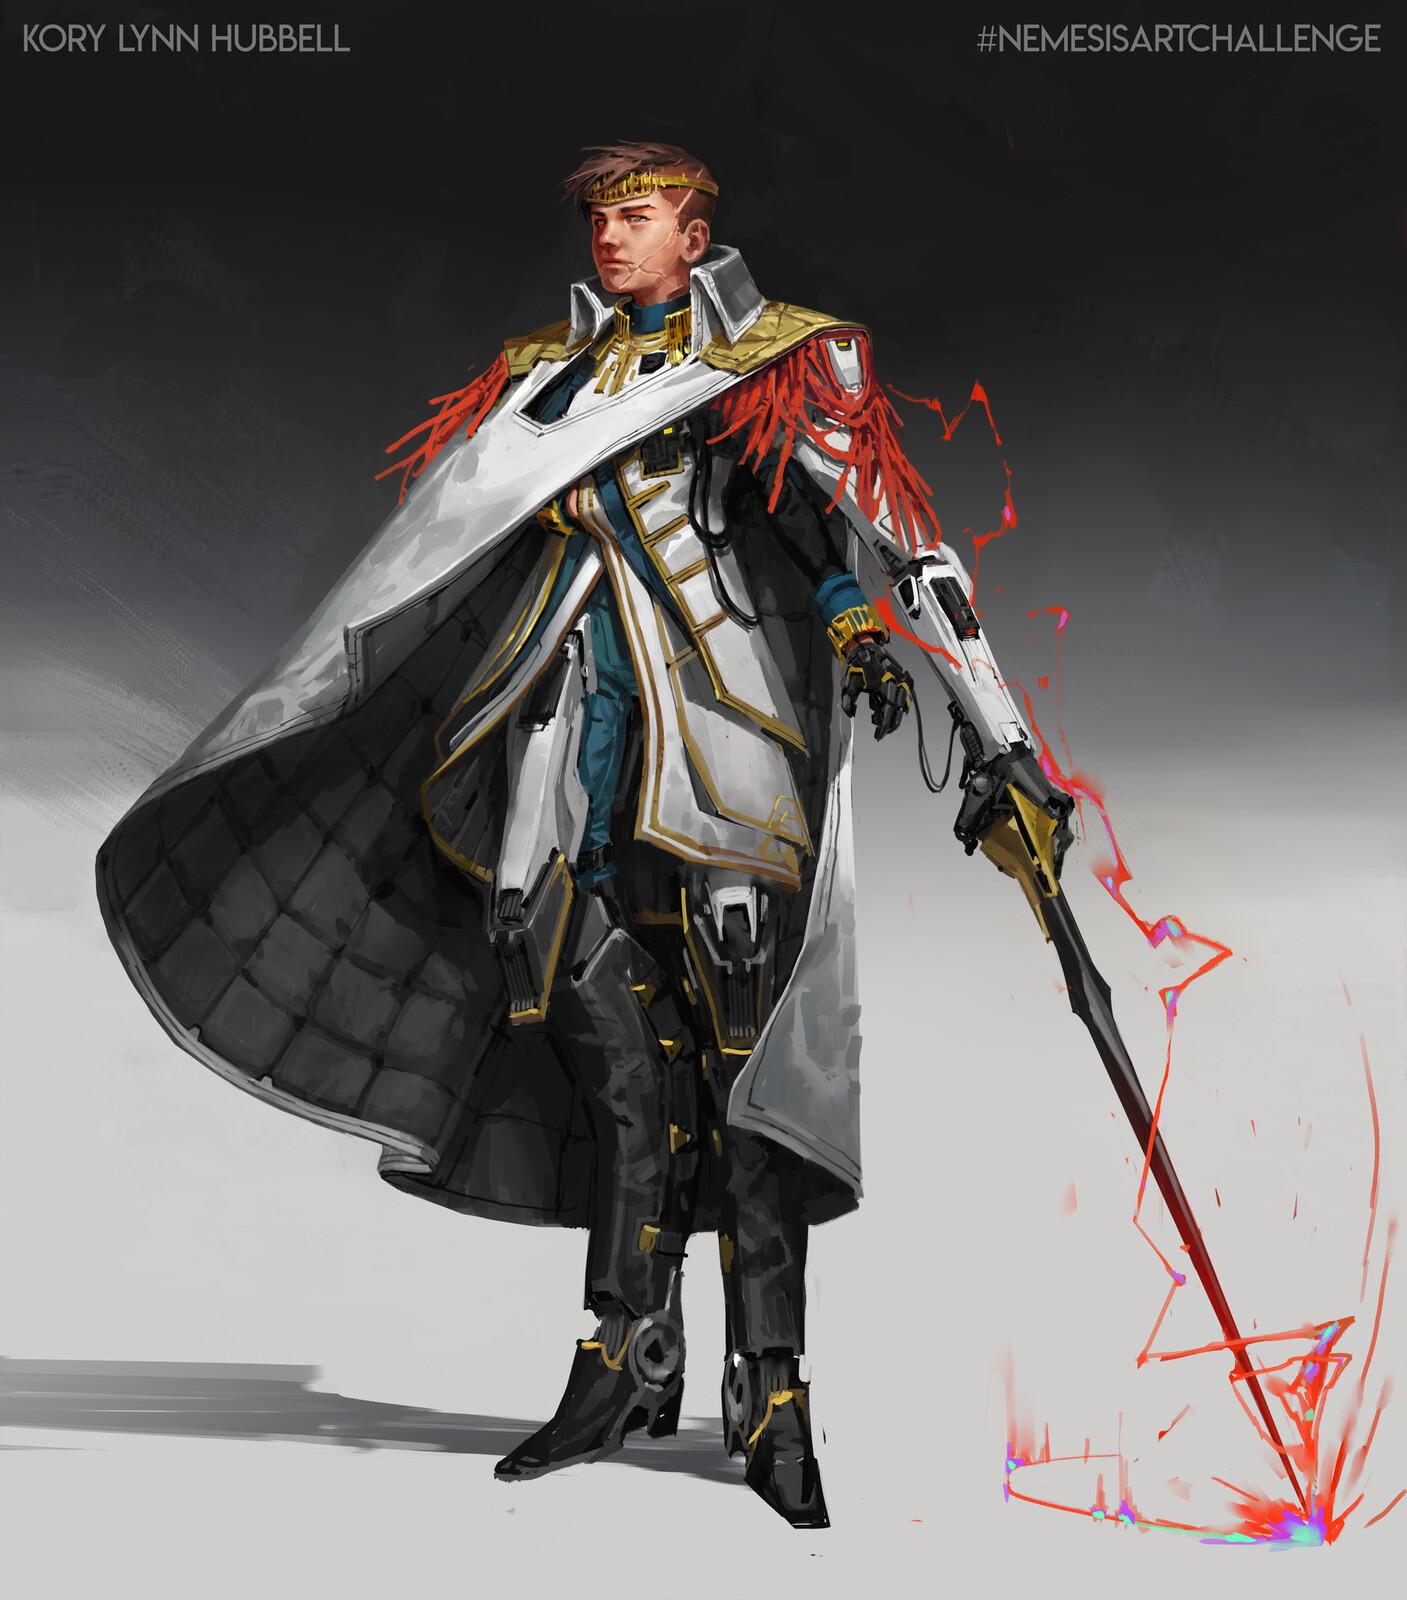 NEMESISARTCHALLENGE 1 Villain: Supreme Lord Kerall